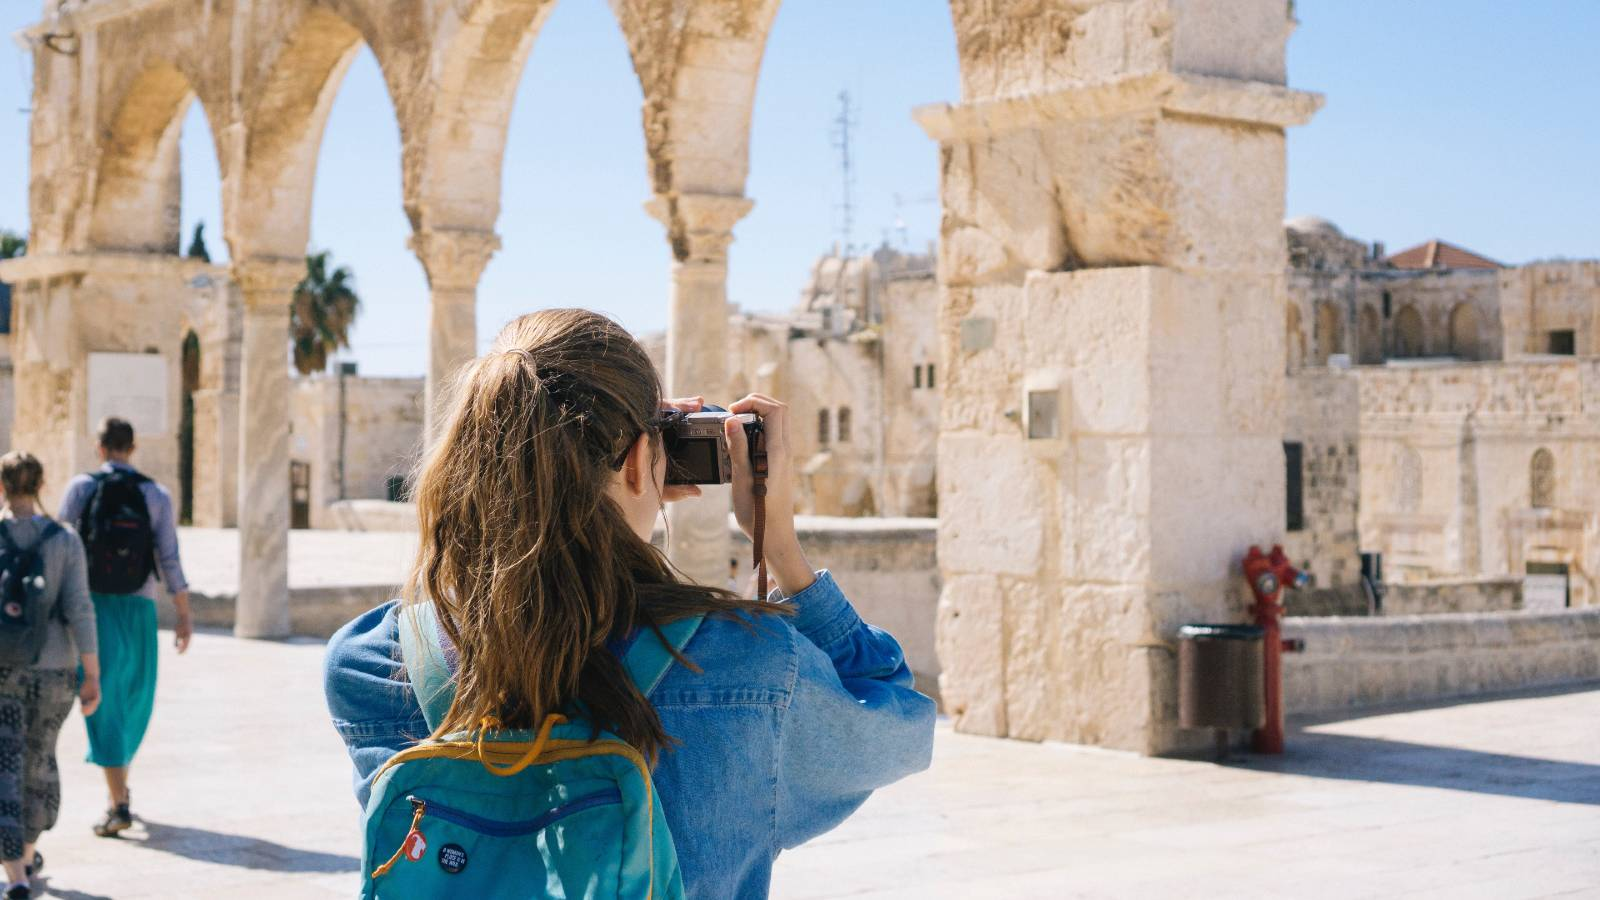 fotografos de viajes TOO MANY FLASH